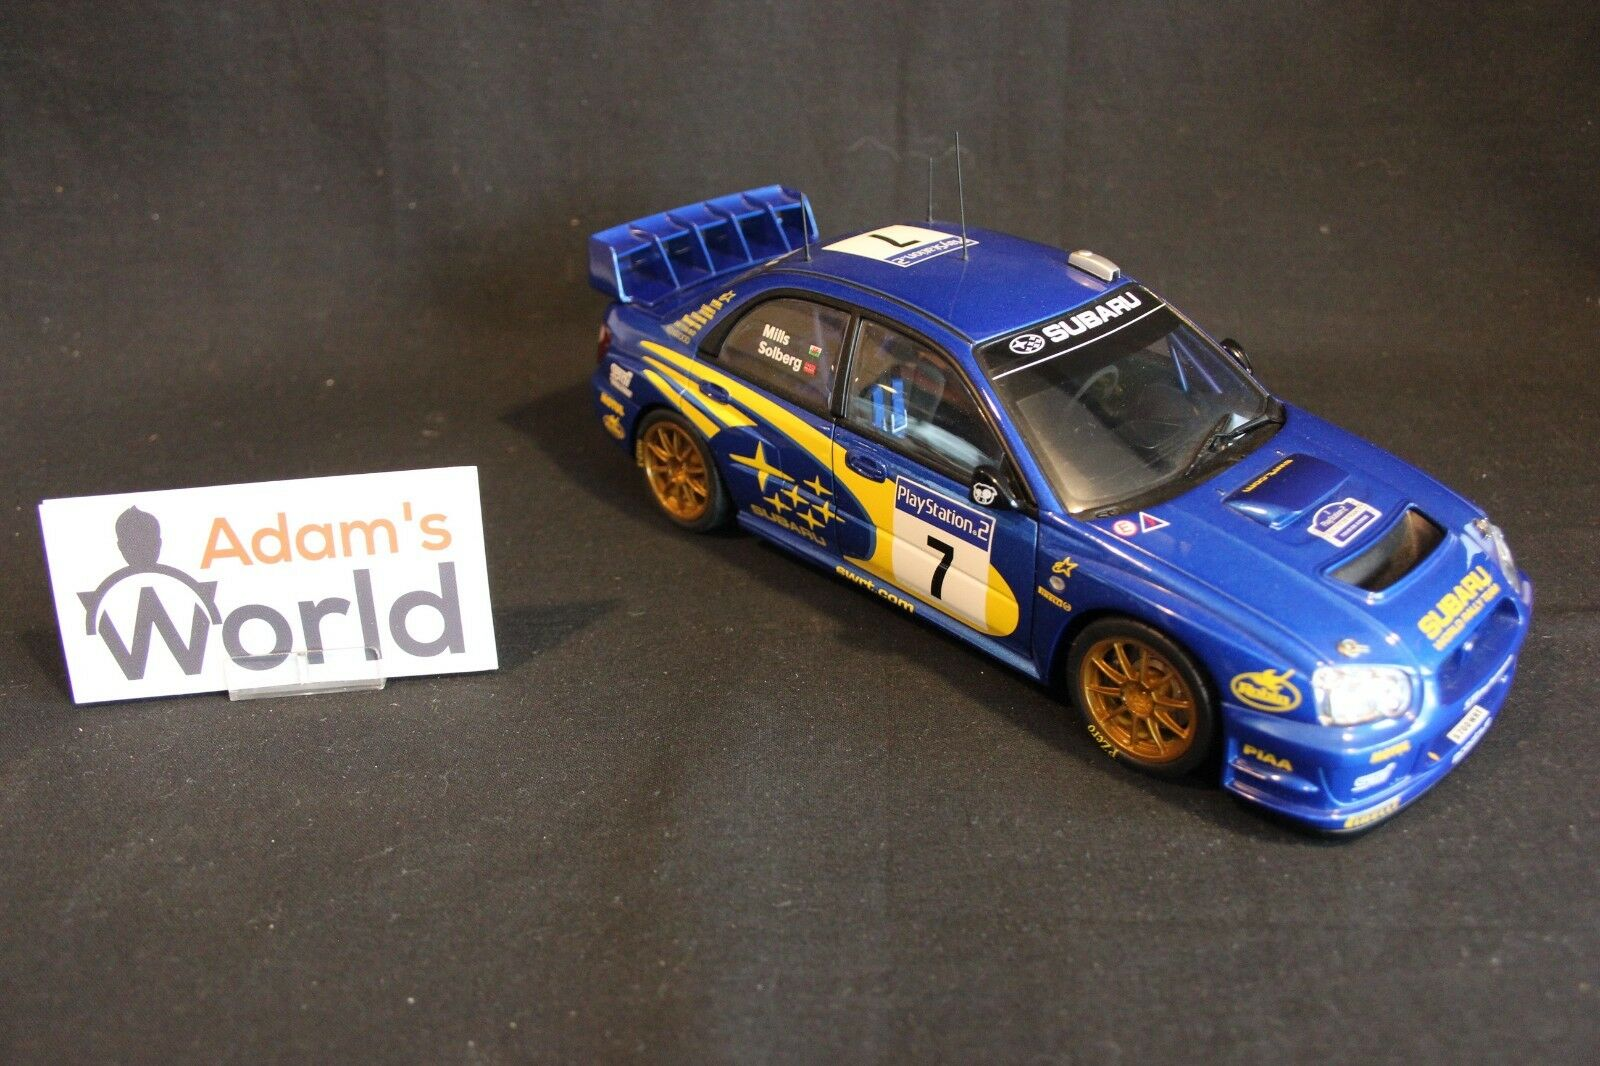 AutoArt Subaru Impreza S9 WRC '03 1 18  7 Solberg  Mills Tour de Corse JvdM